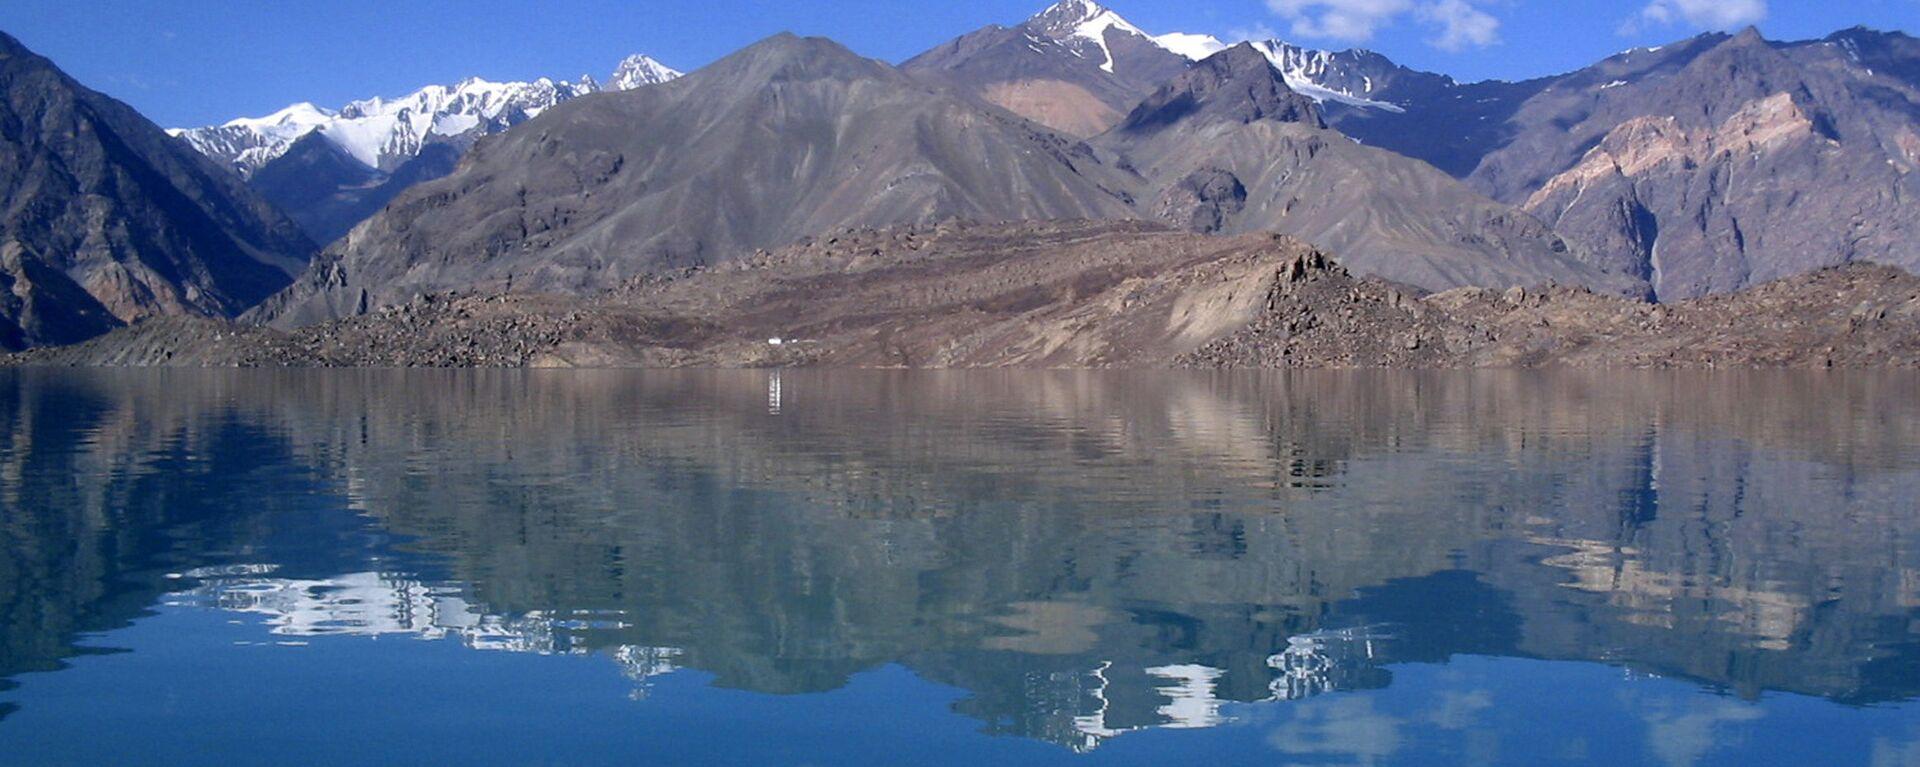 Сарезское озеро в горах Памира, архивное фото - Sputnik Таджикистан, 1920, 31.05.2019